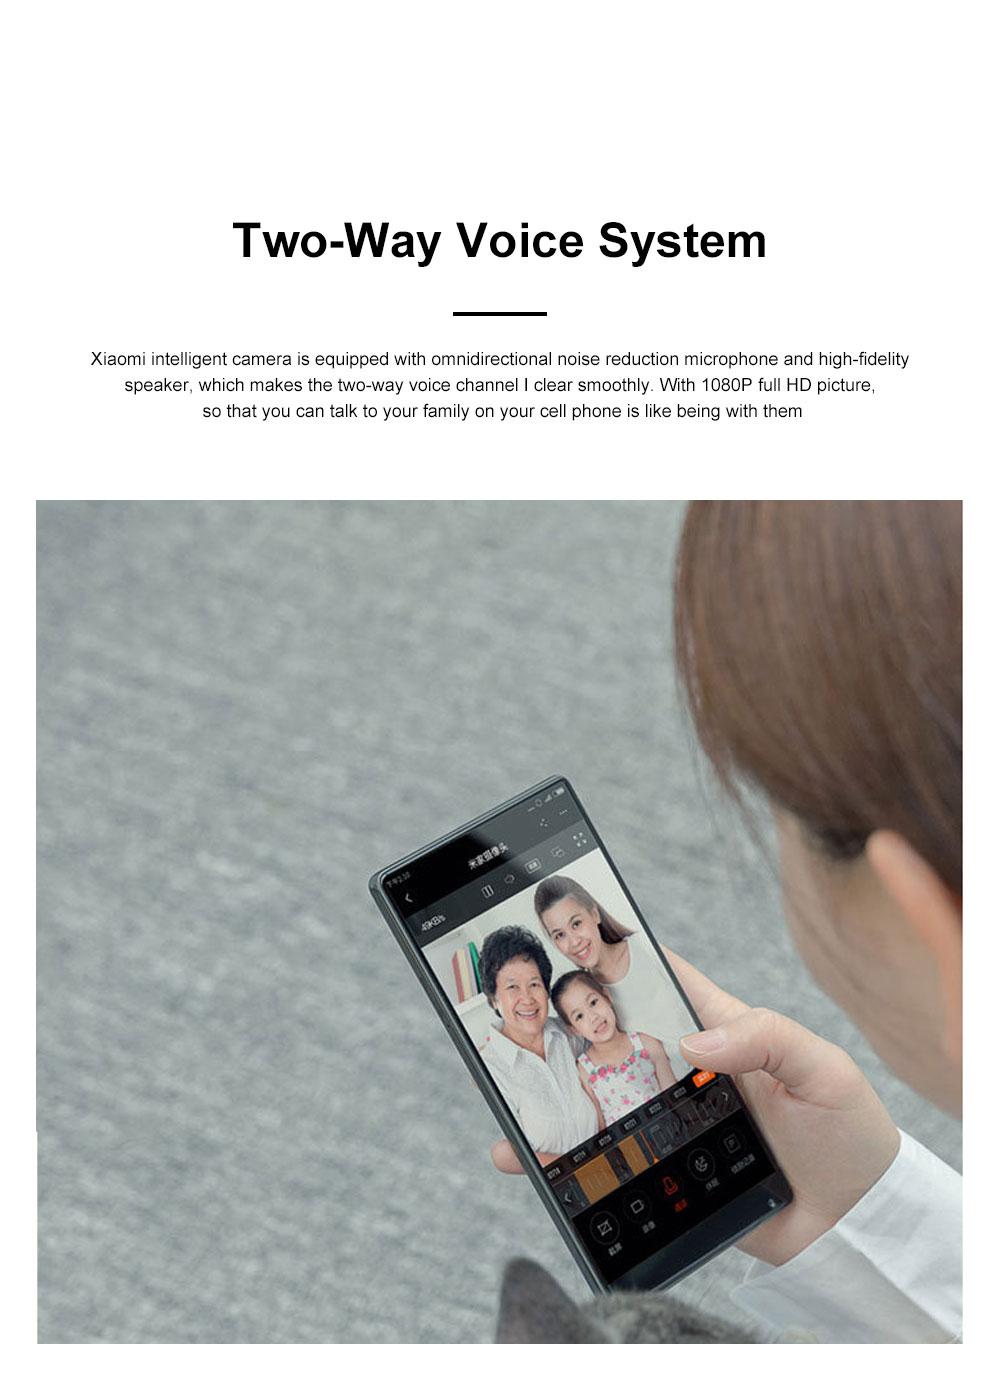 Xiaomi Wireless Smart Camera 1080P Home Monitoring Micro Infrared Night Vision HD Camera Security Camera Baby Monitor 9